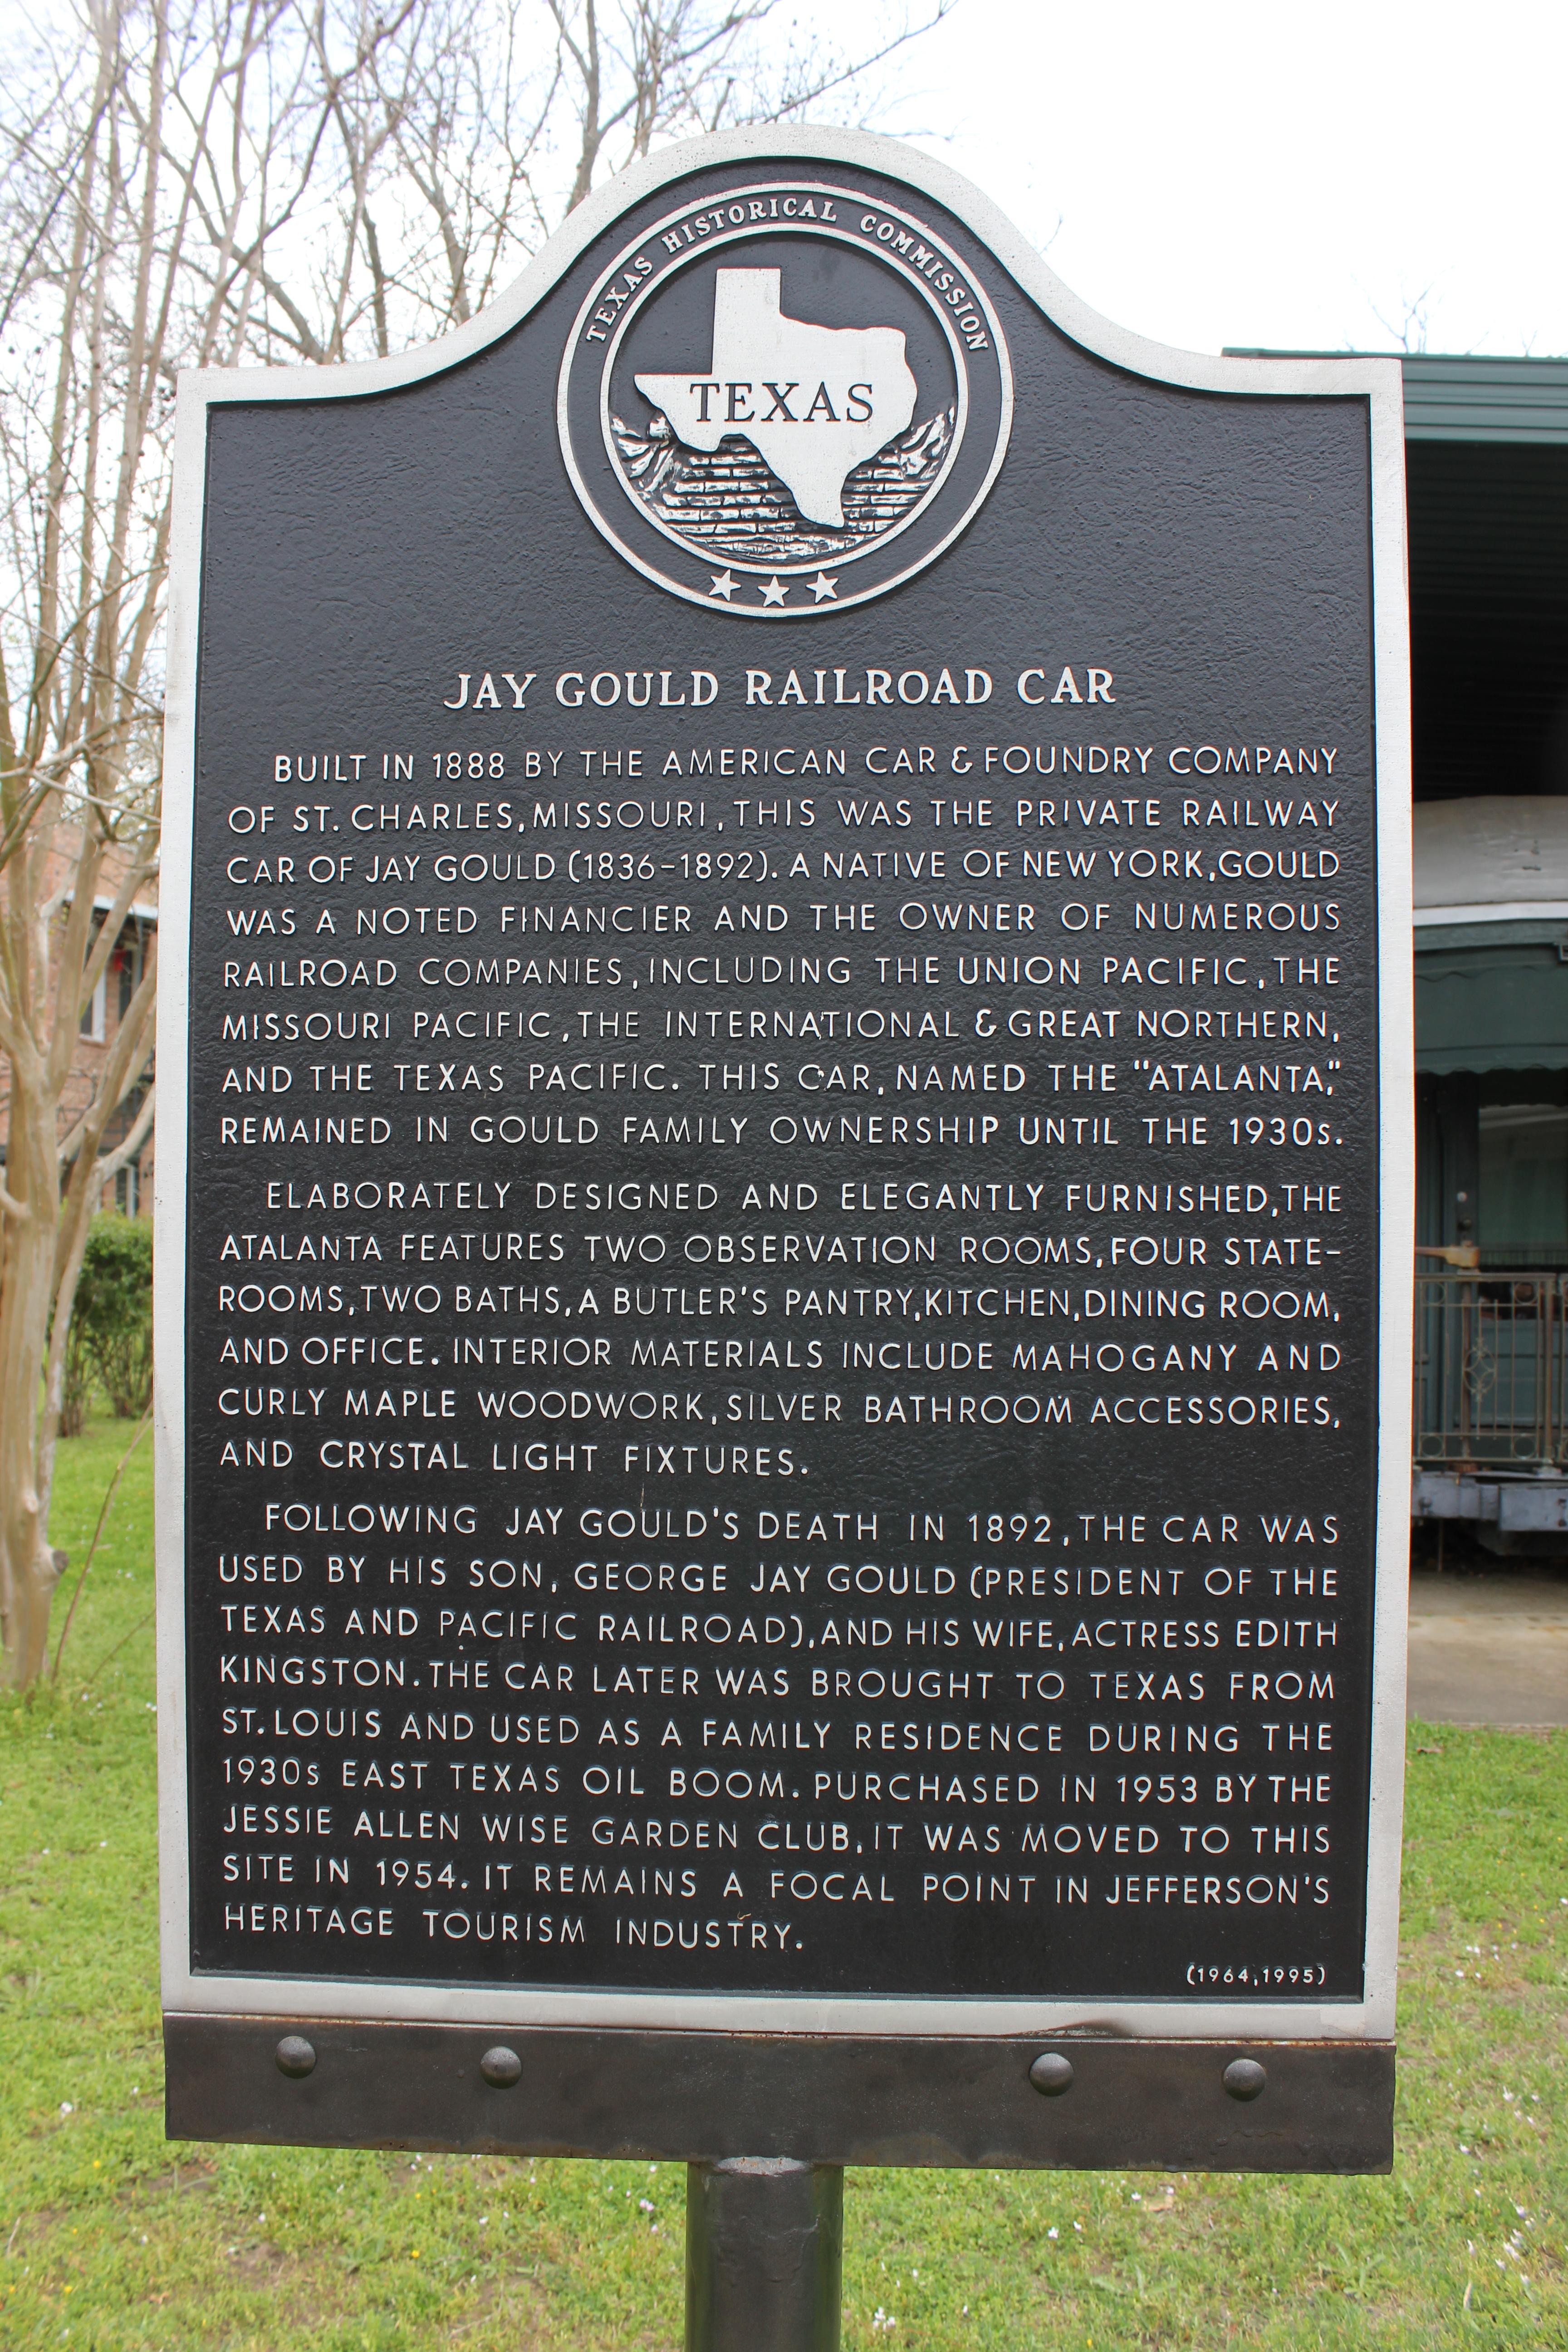 Car bathroom accessories - File Jay Gould Railroad Car Jefferson Texas Historical Marker 7304795176